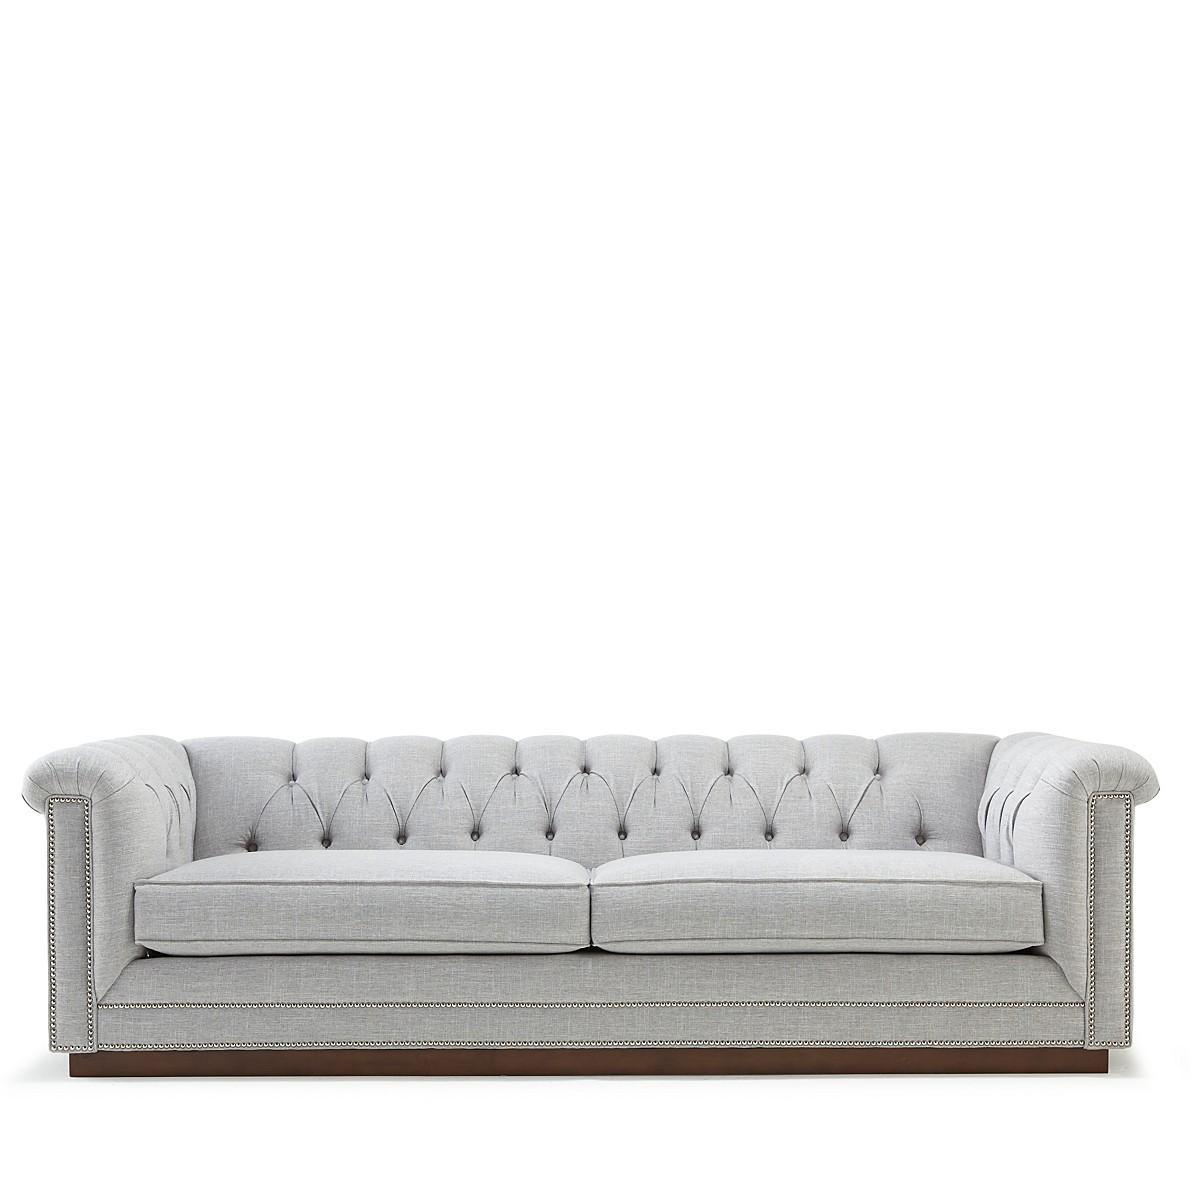 Bloomingdales Sofa | Sofa Gallery | Kengire With Bloomingdales Sofas (Image 19 of 20)